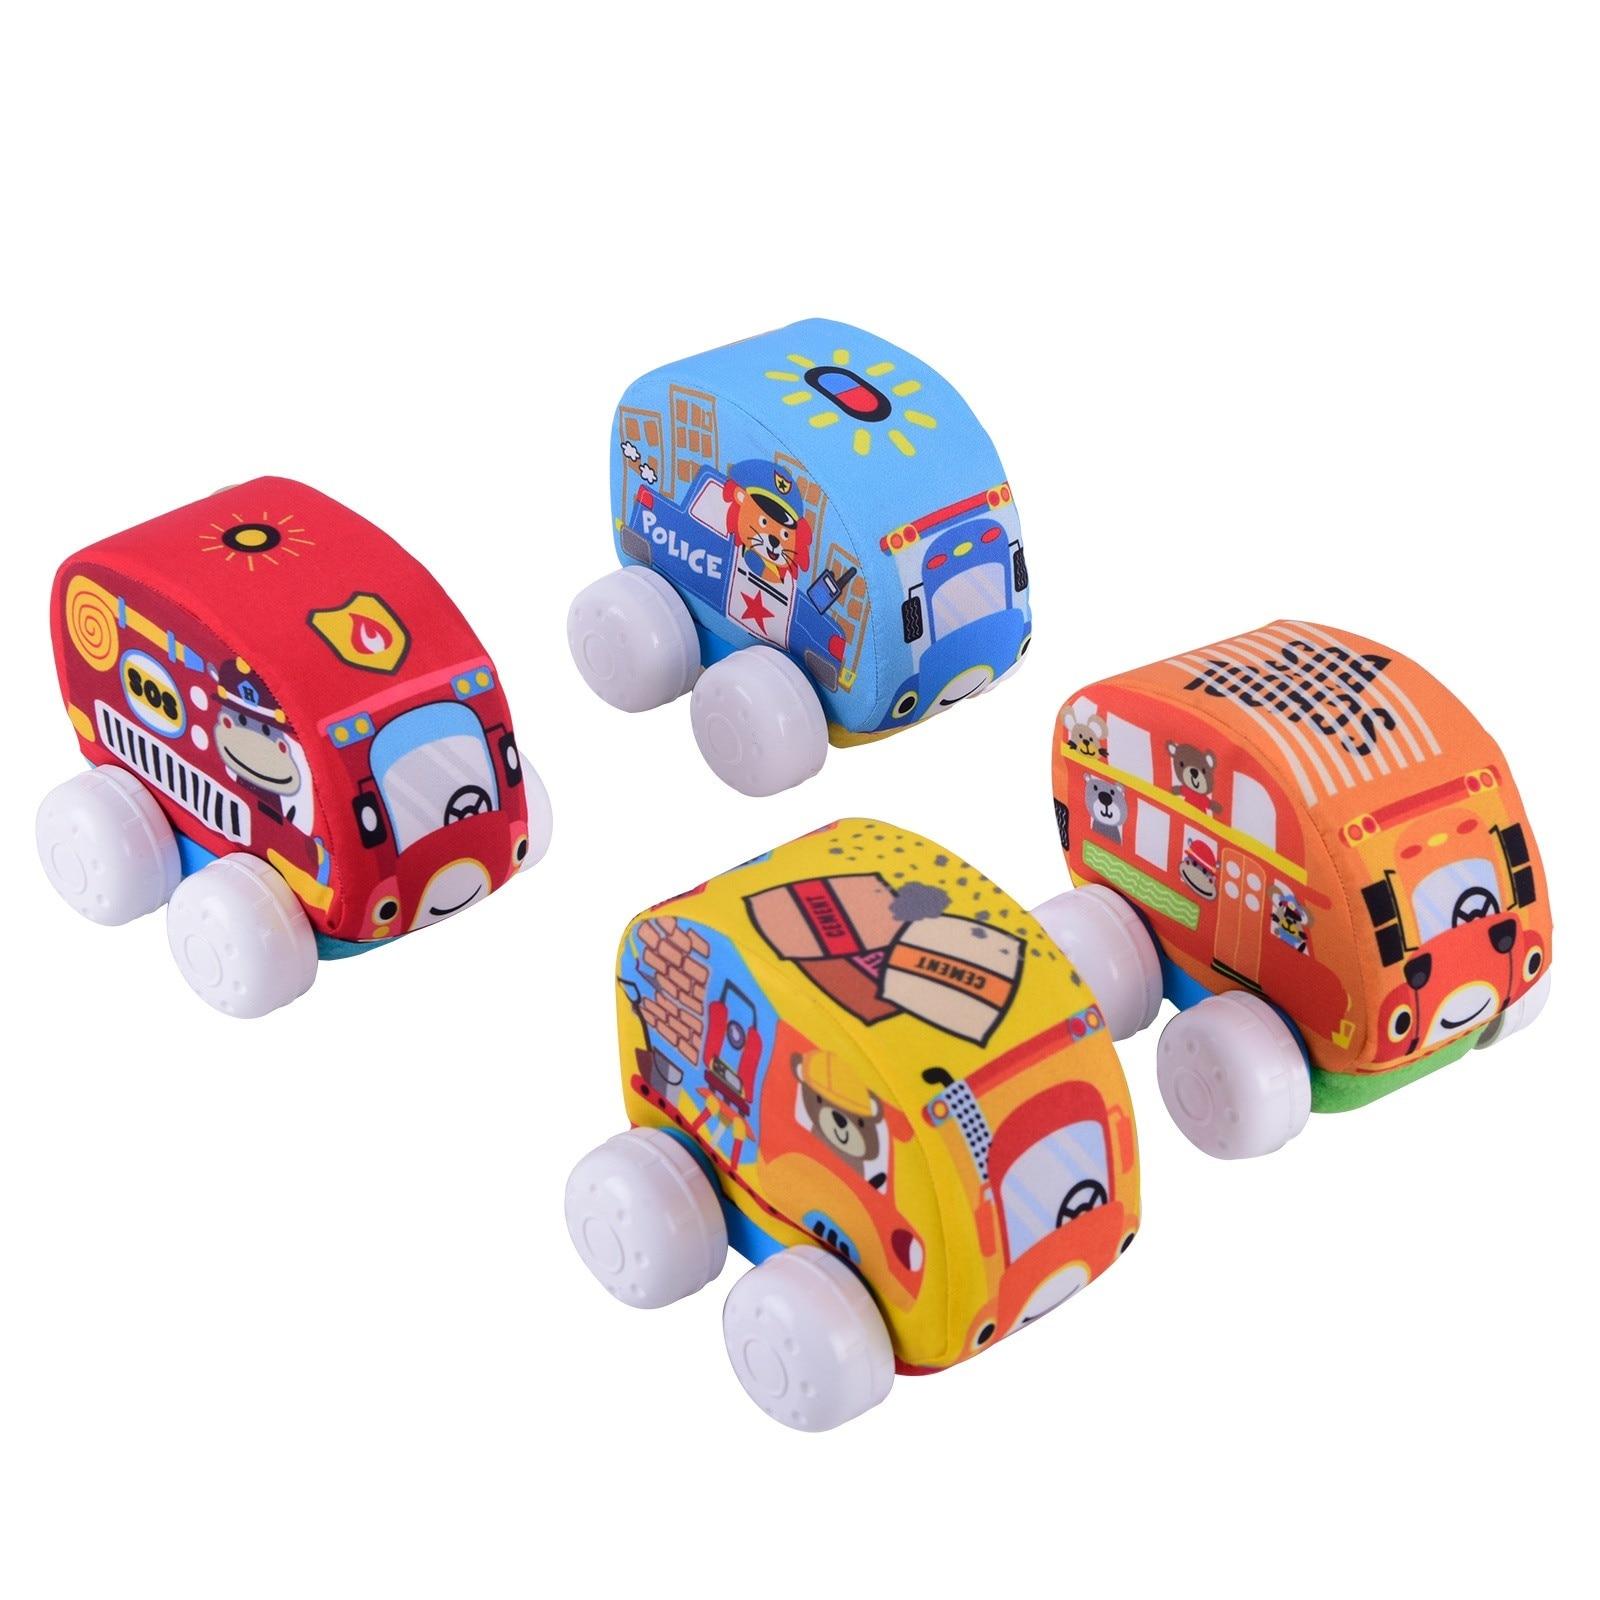 Ebebek Zuzu Plush Baby Toy Car 1 Pcs